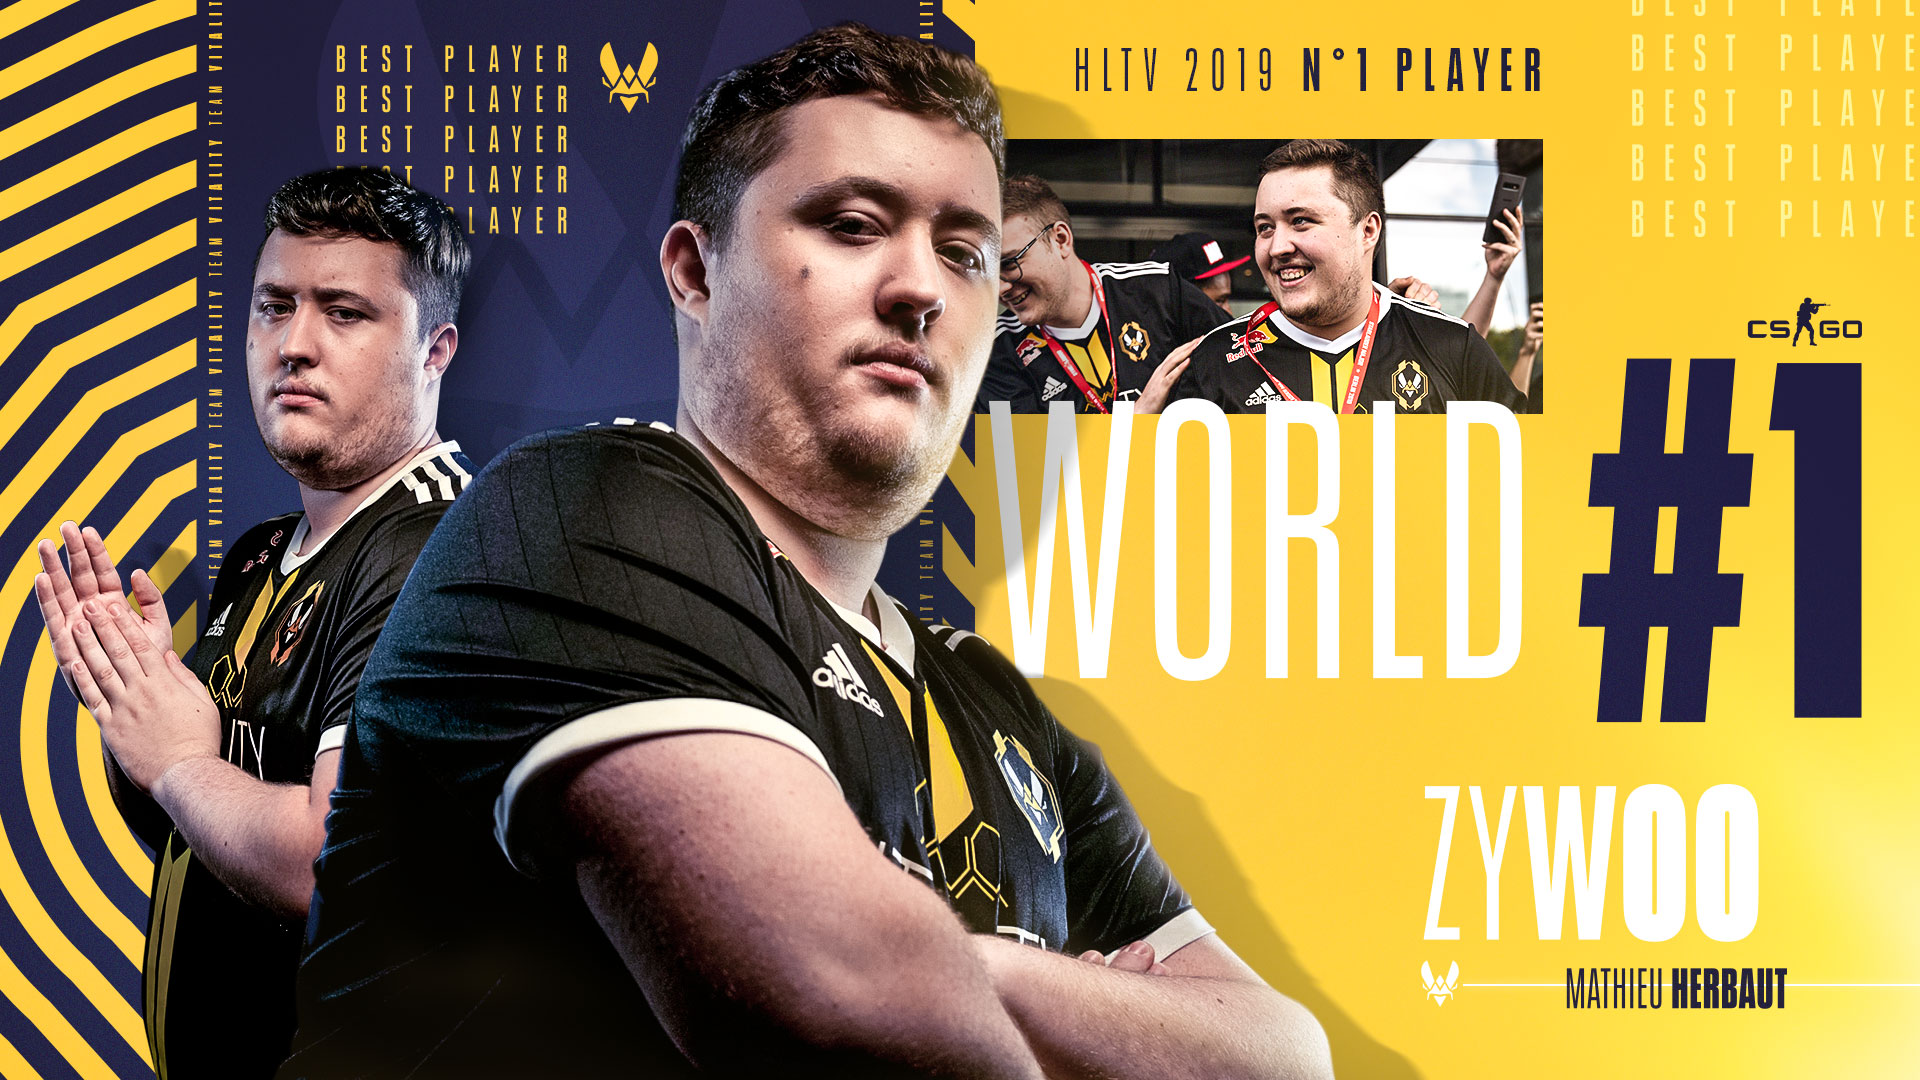 zywoo-meilleur-joueur